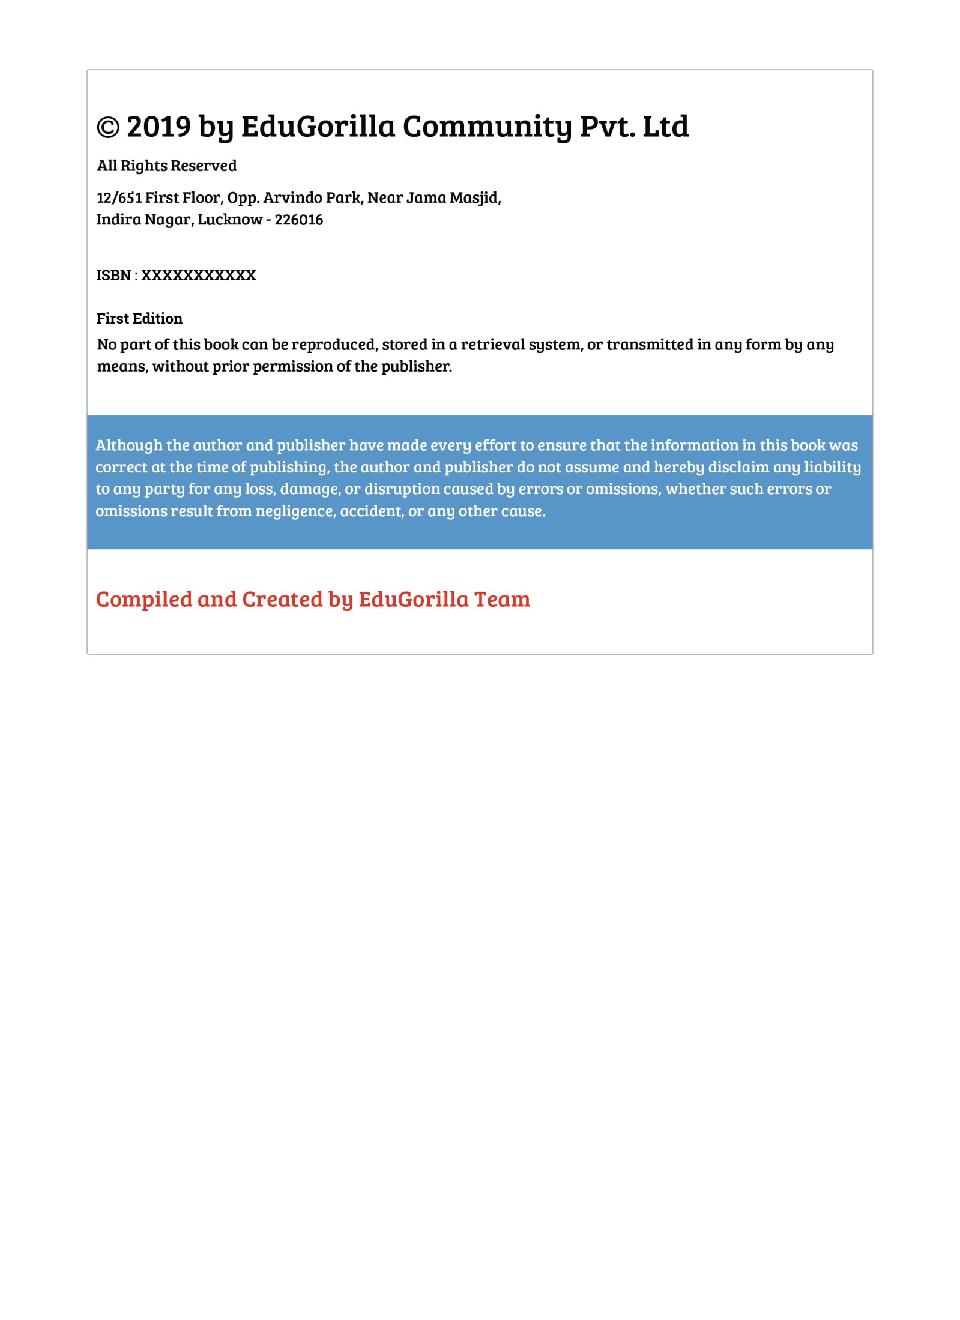 EduGorilla All India Bar Examination (Bar Council) 2020   10 Mock tests + 6 Practice Tests - Page 4